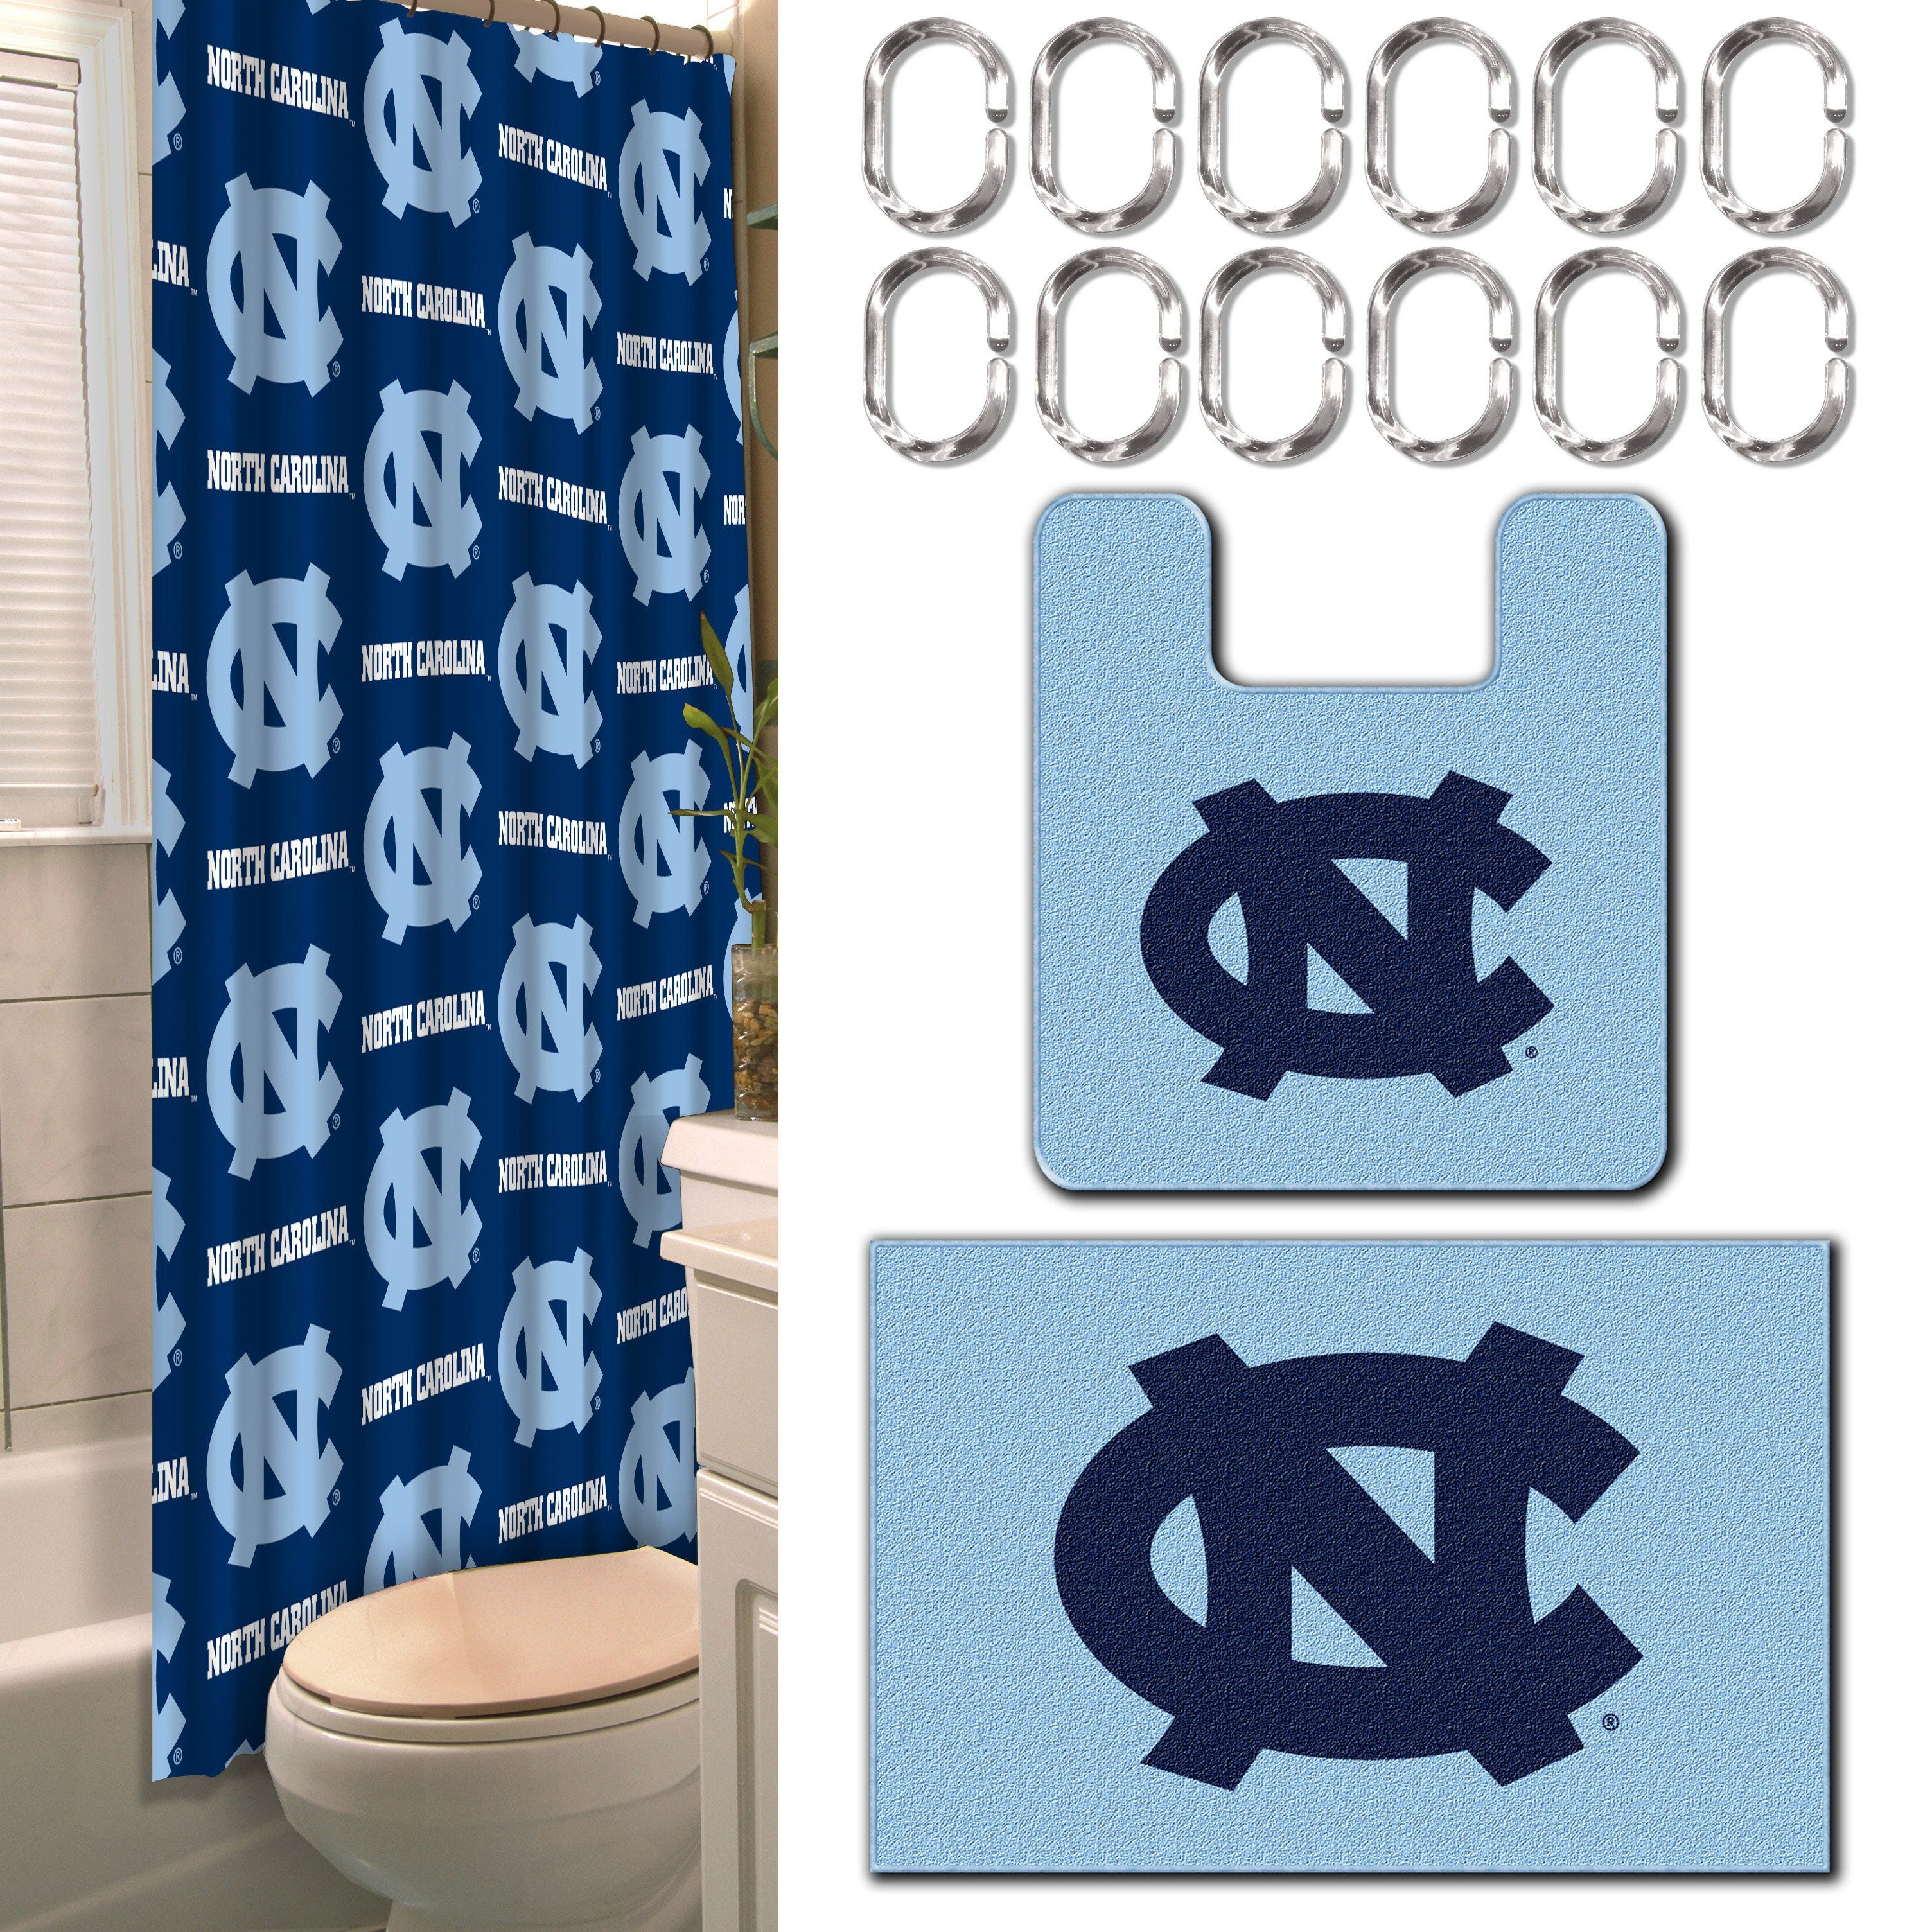 UNC Collegiate 15 Piece Bath Set 12 2 Shower Curtain Rings